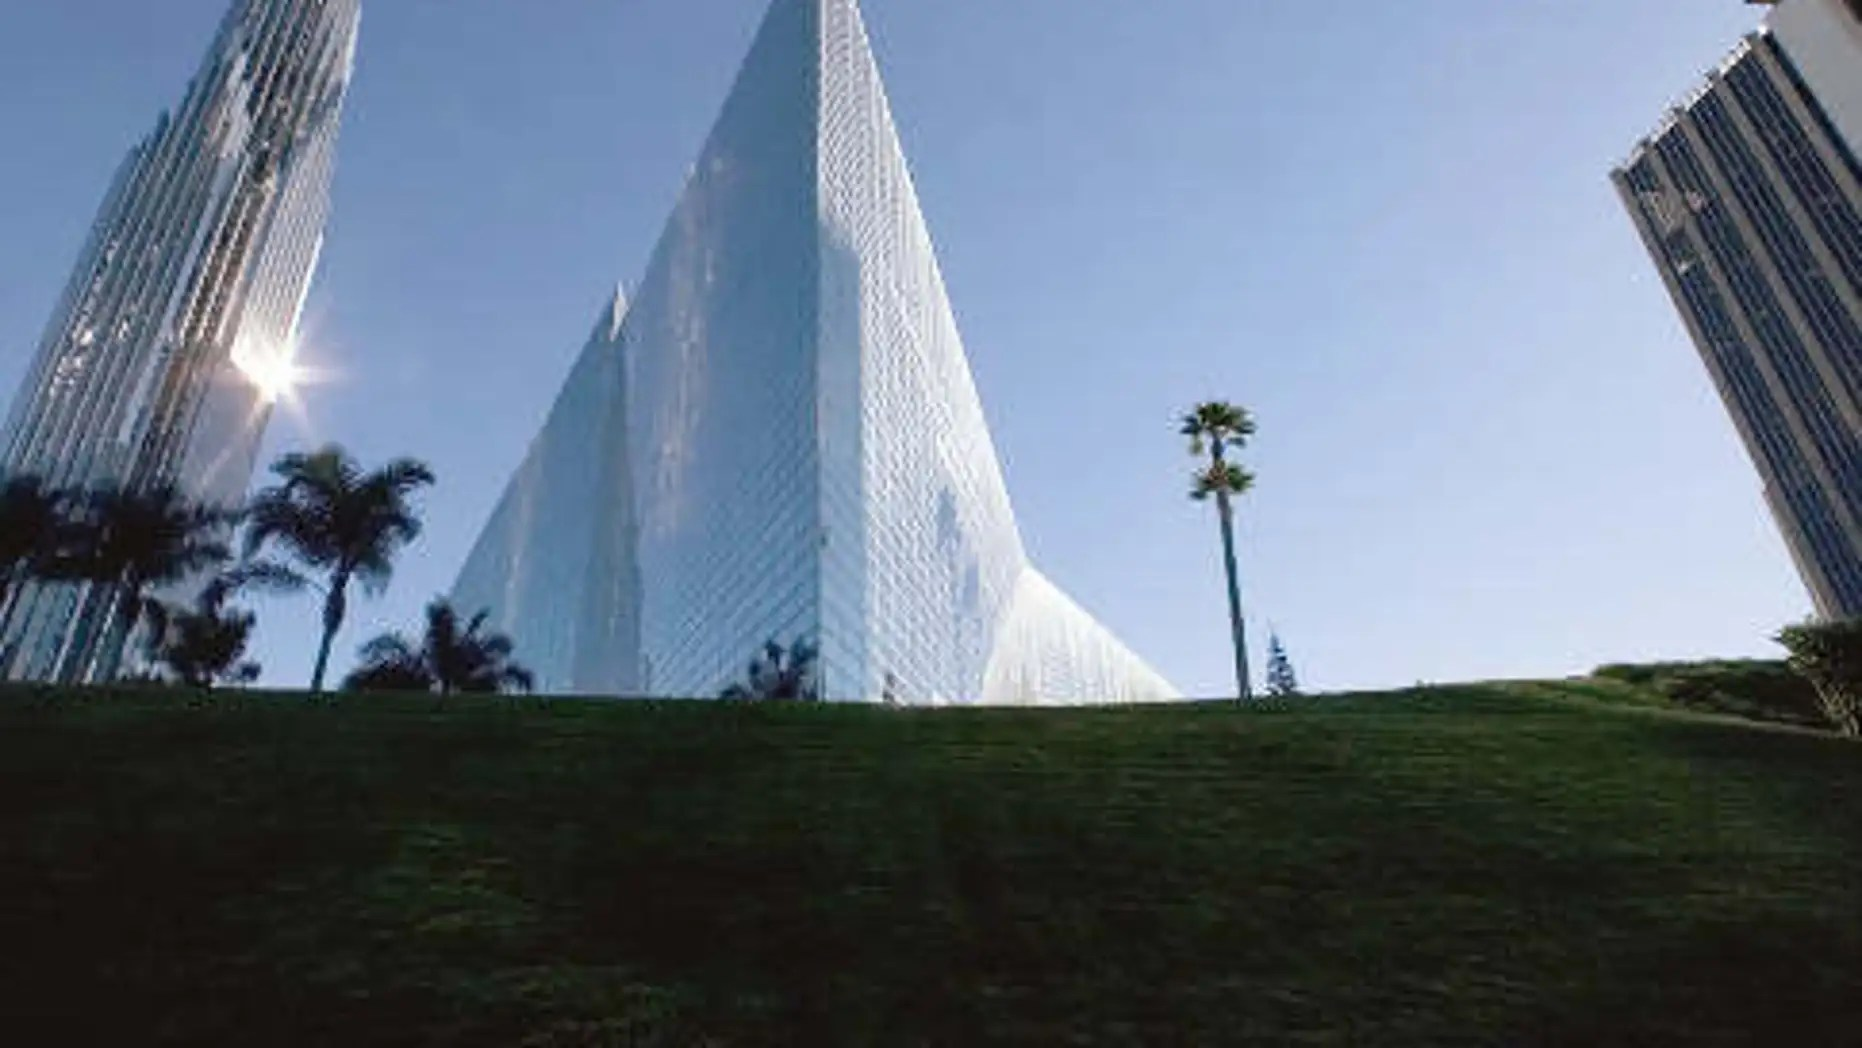 california megachurch crystal cathedral